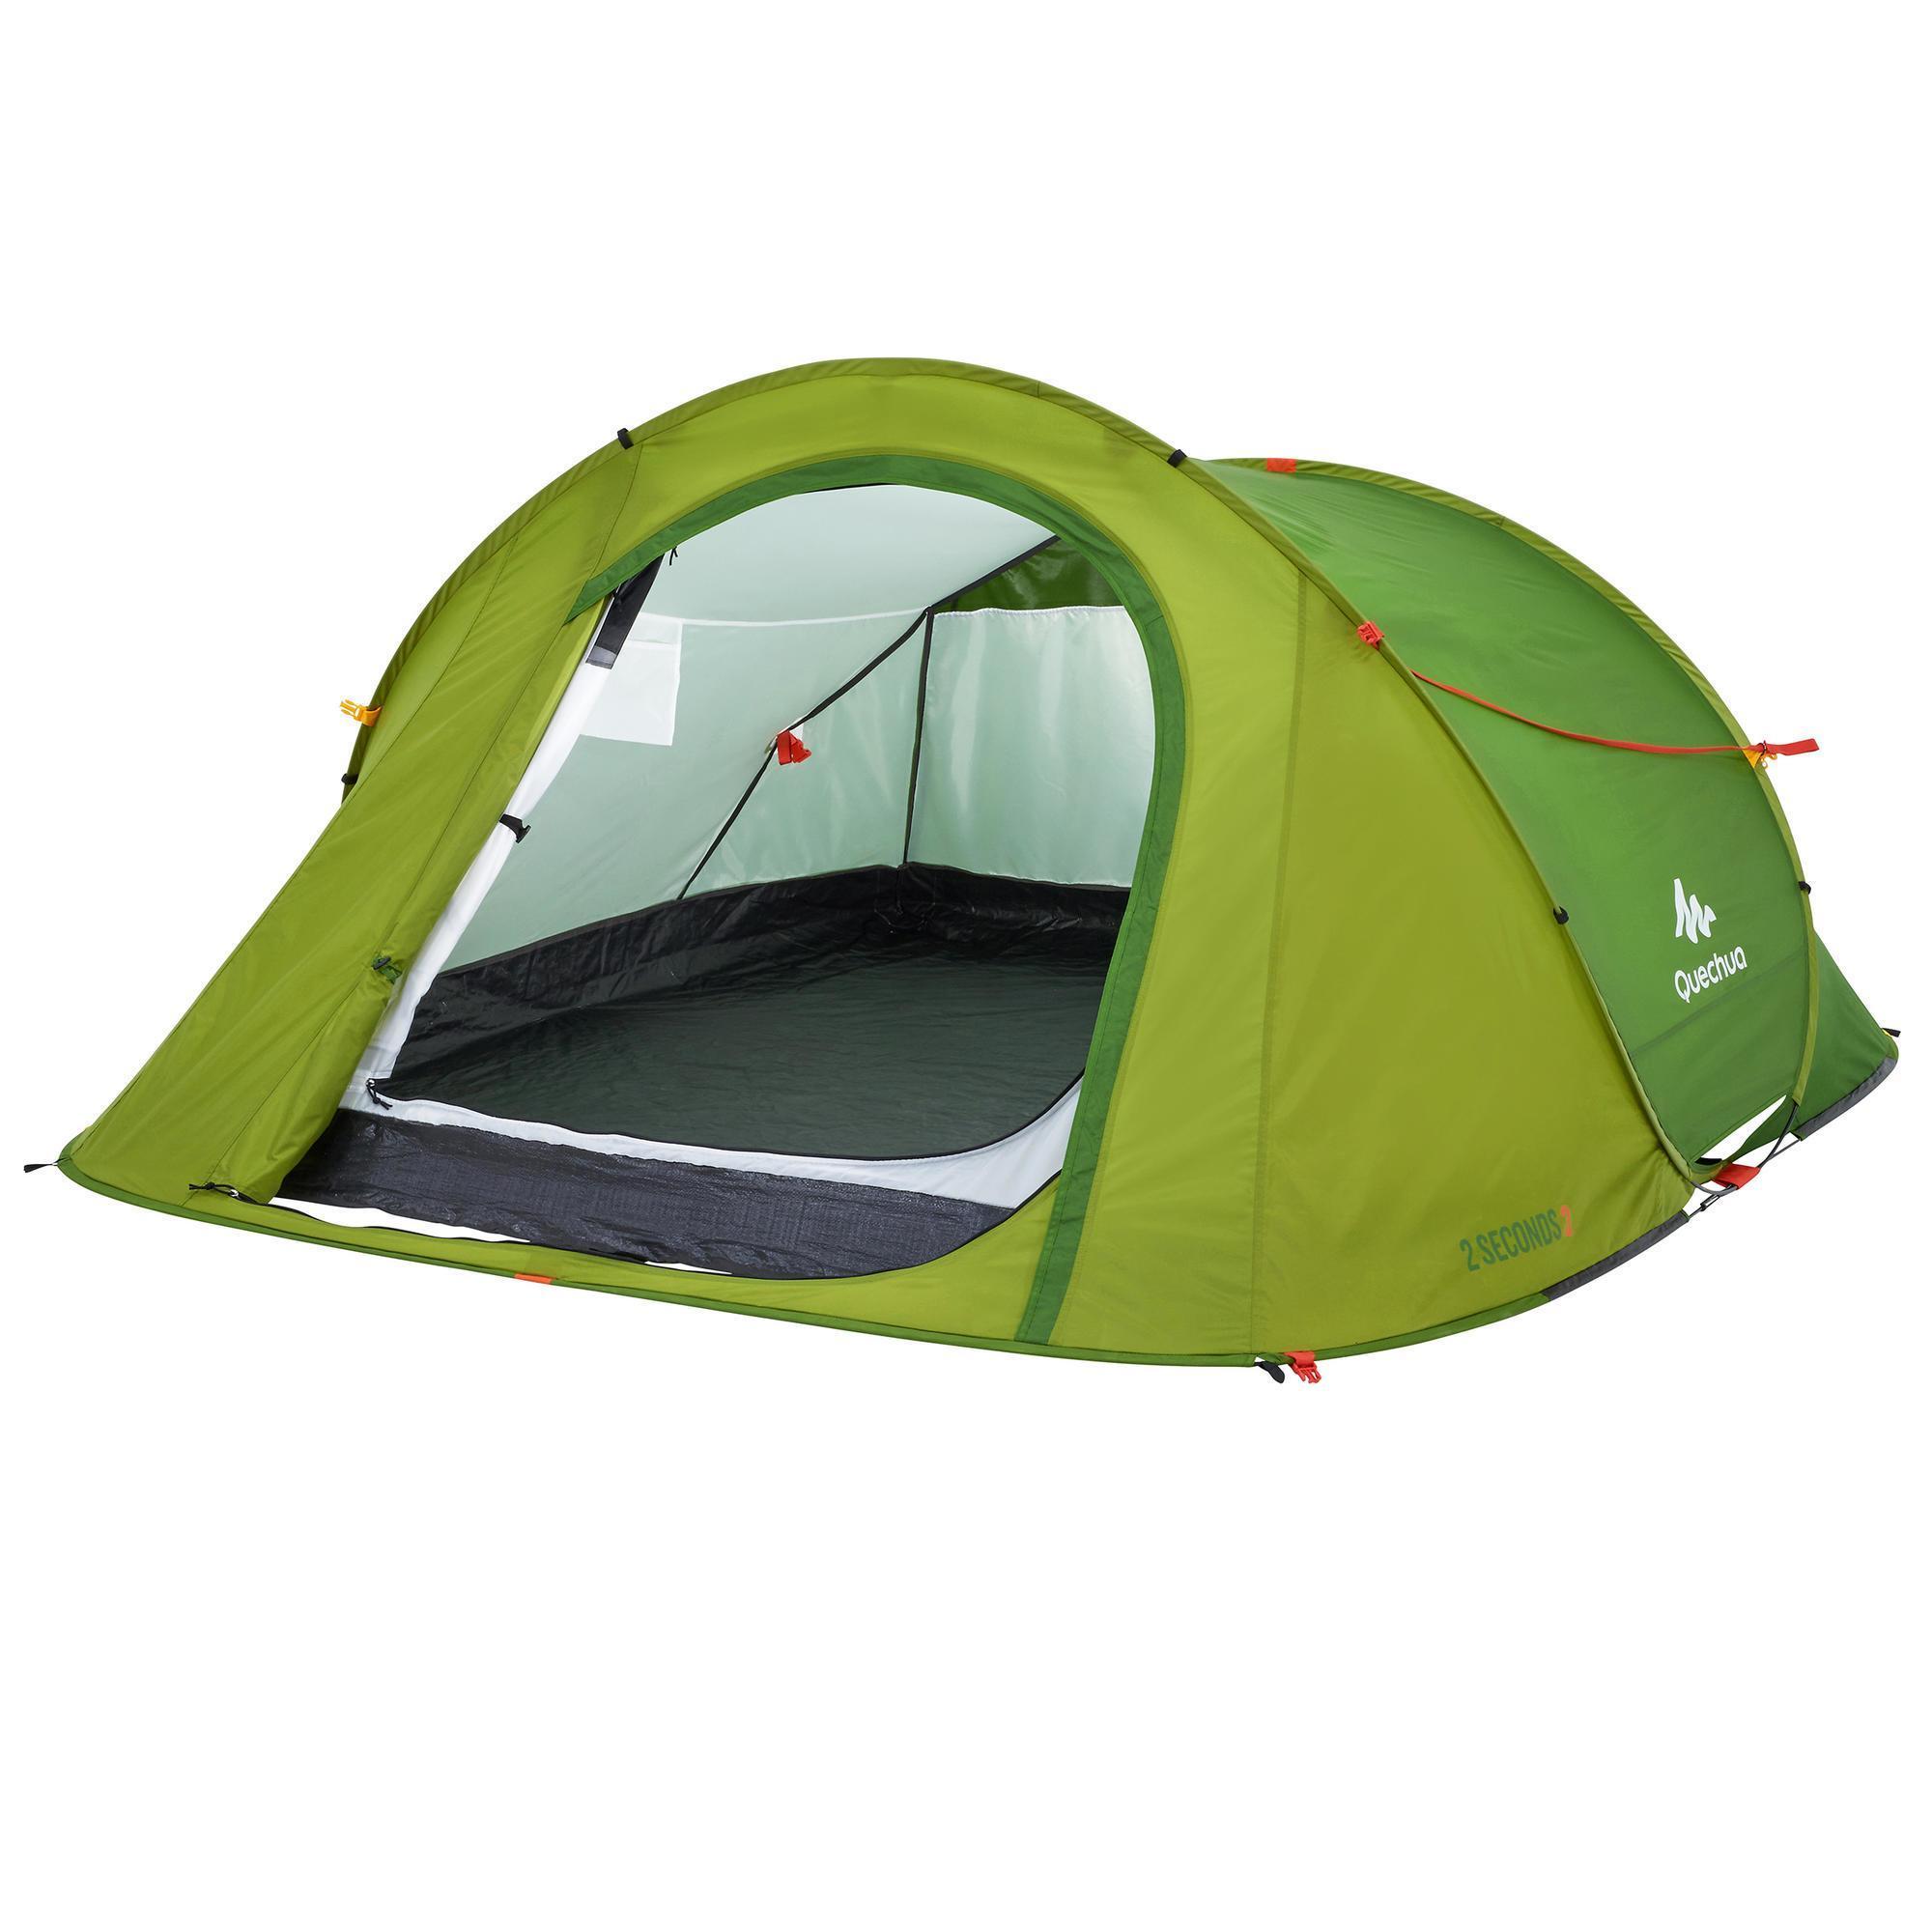 tente de camping 2 seconds easy 3 personnes vert quechua. Black Bedroom Furniture Sets. Home Design Ideas